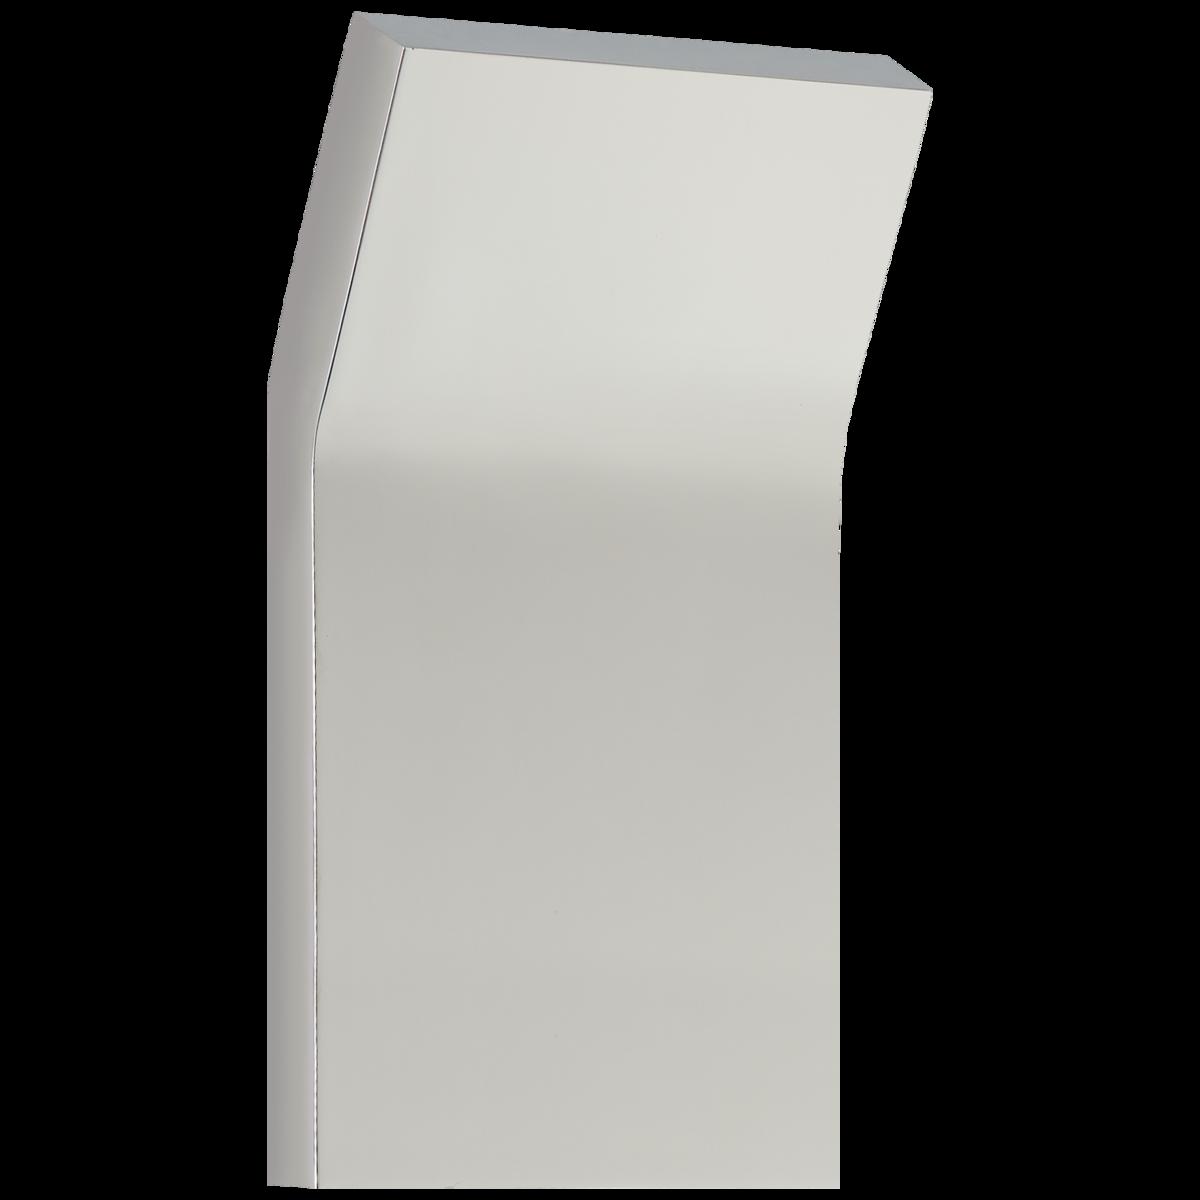 Bend Medium Square Light